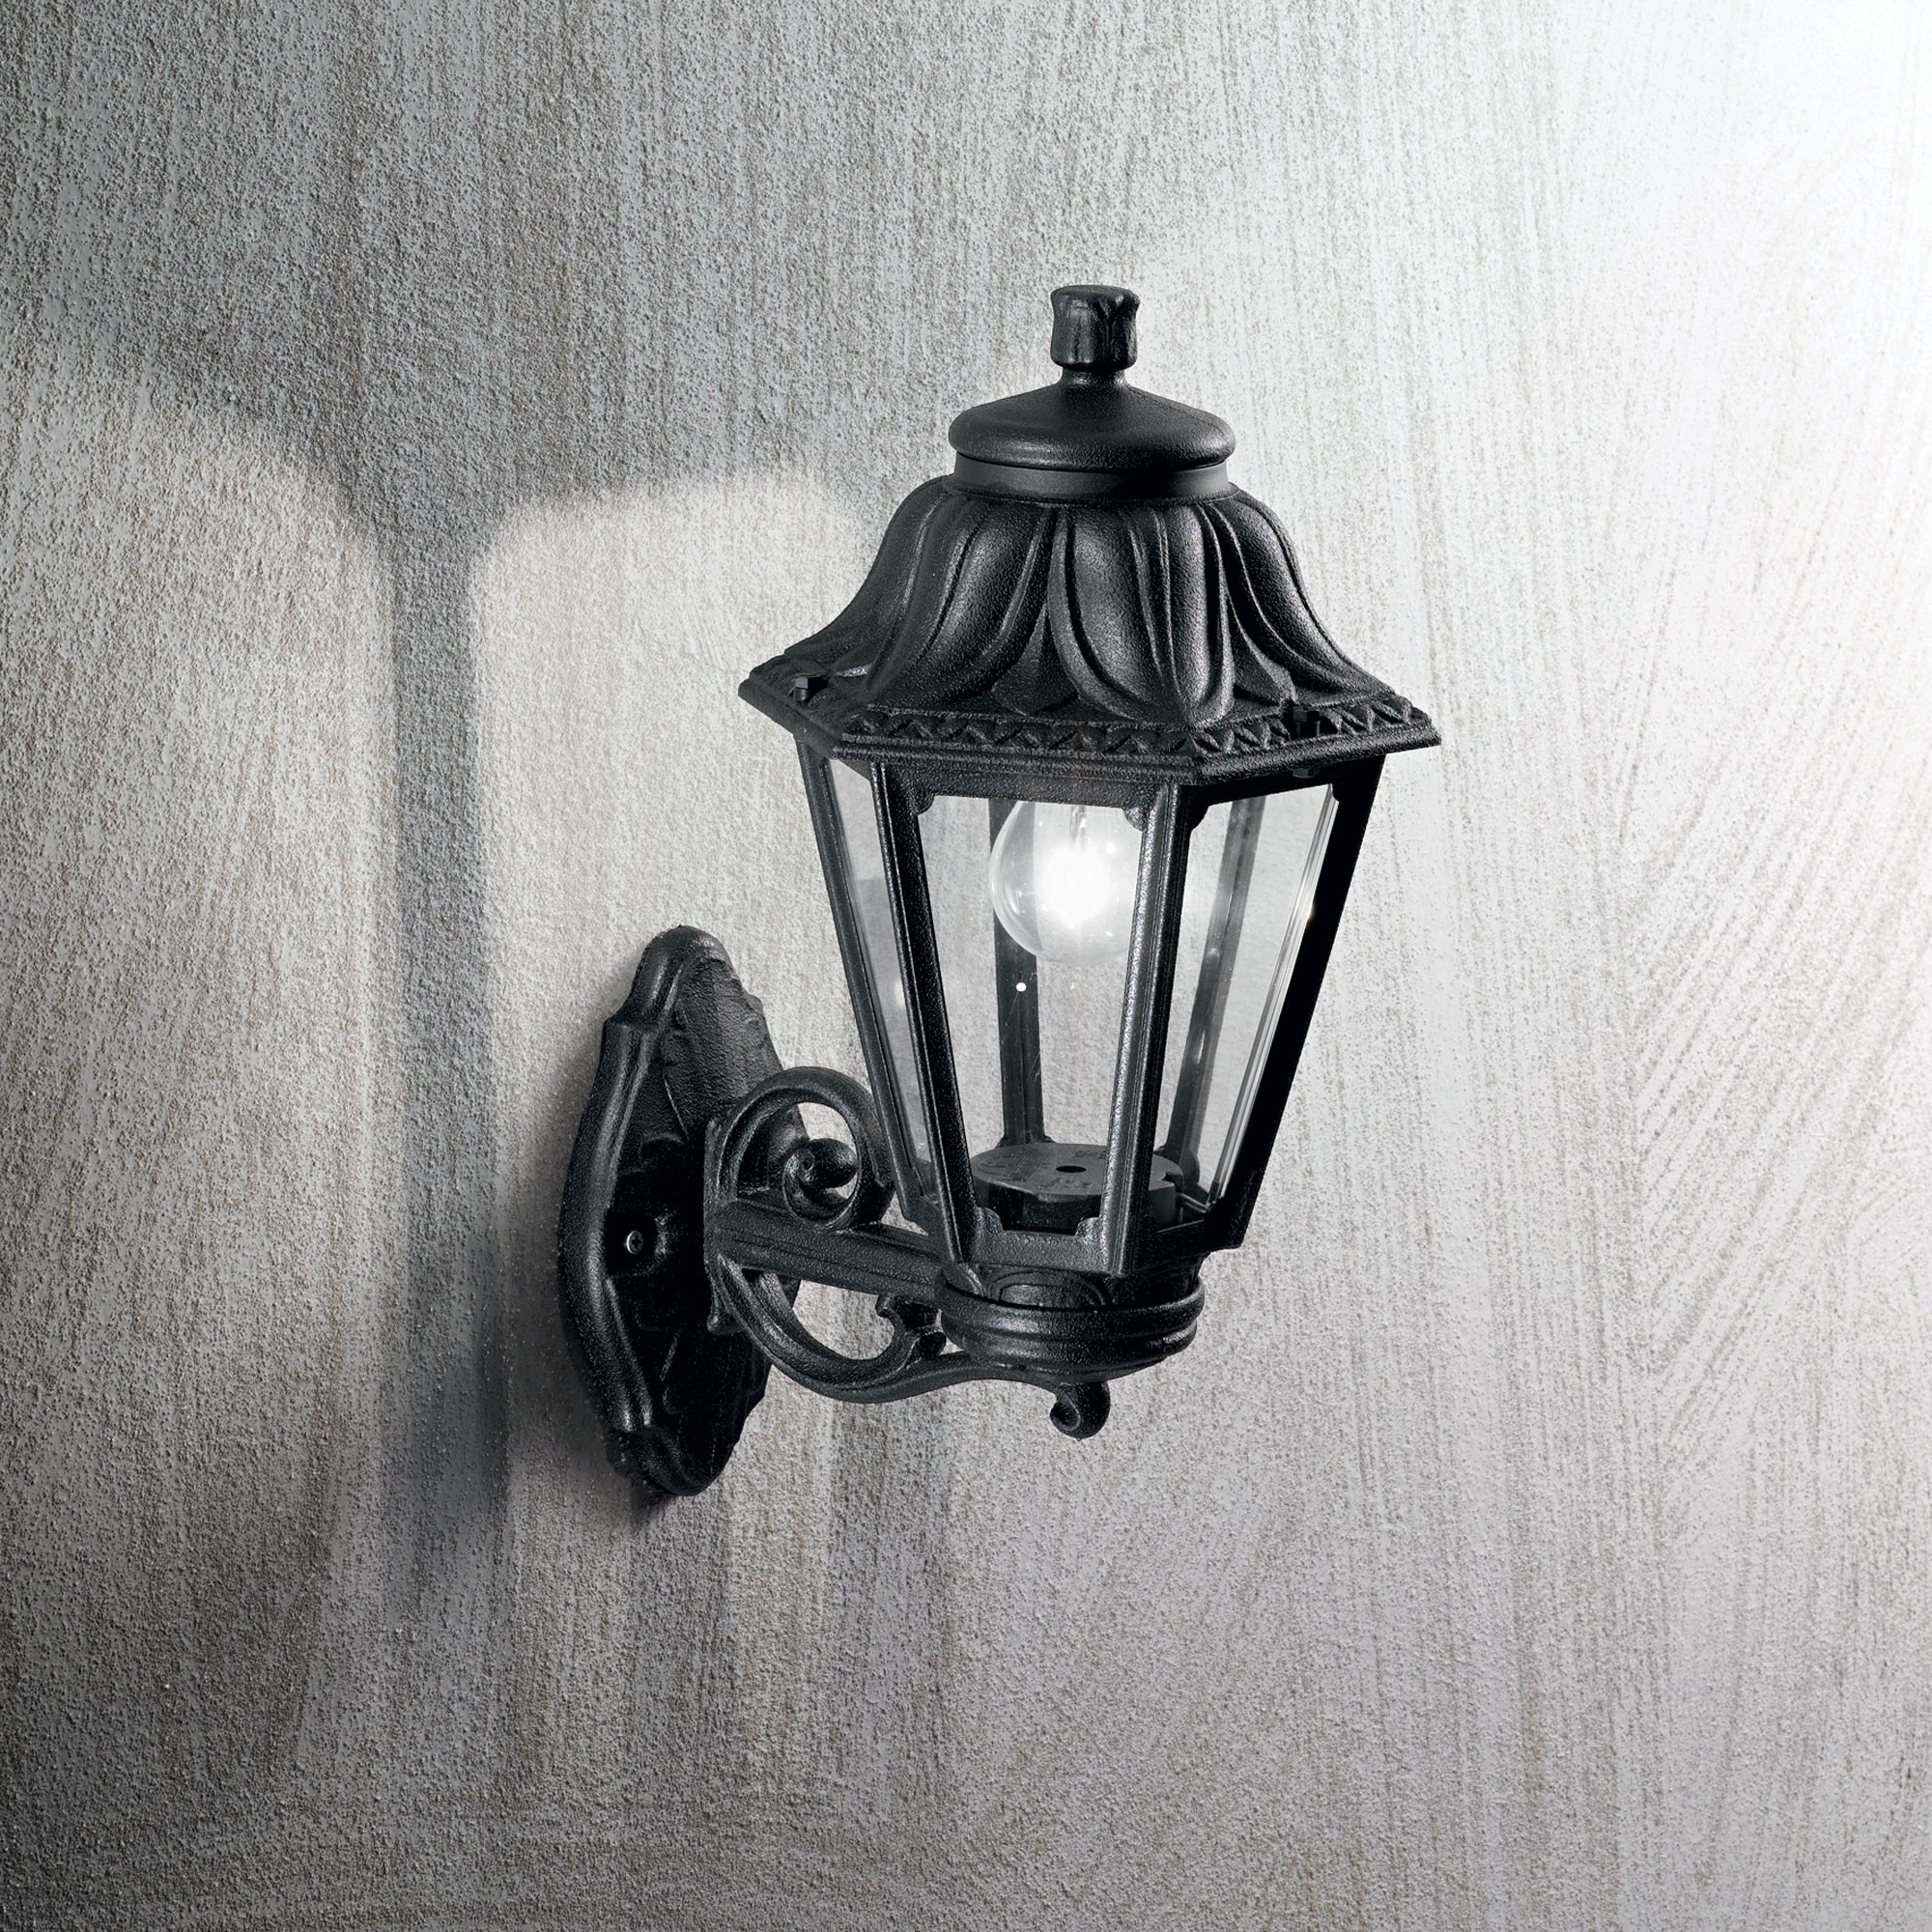 Ideal Lux 101491 ANNA AP1 BIG NERO kültéri fali lámpa